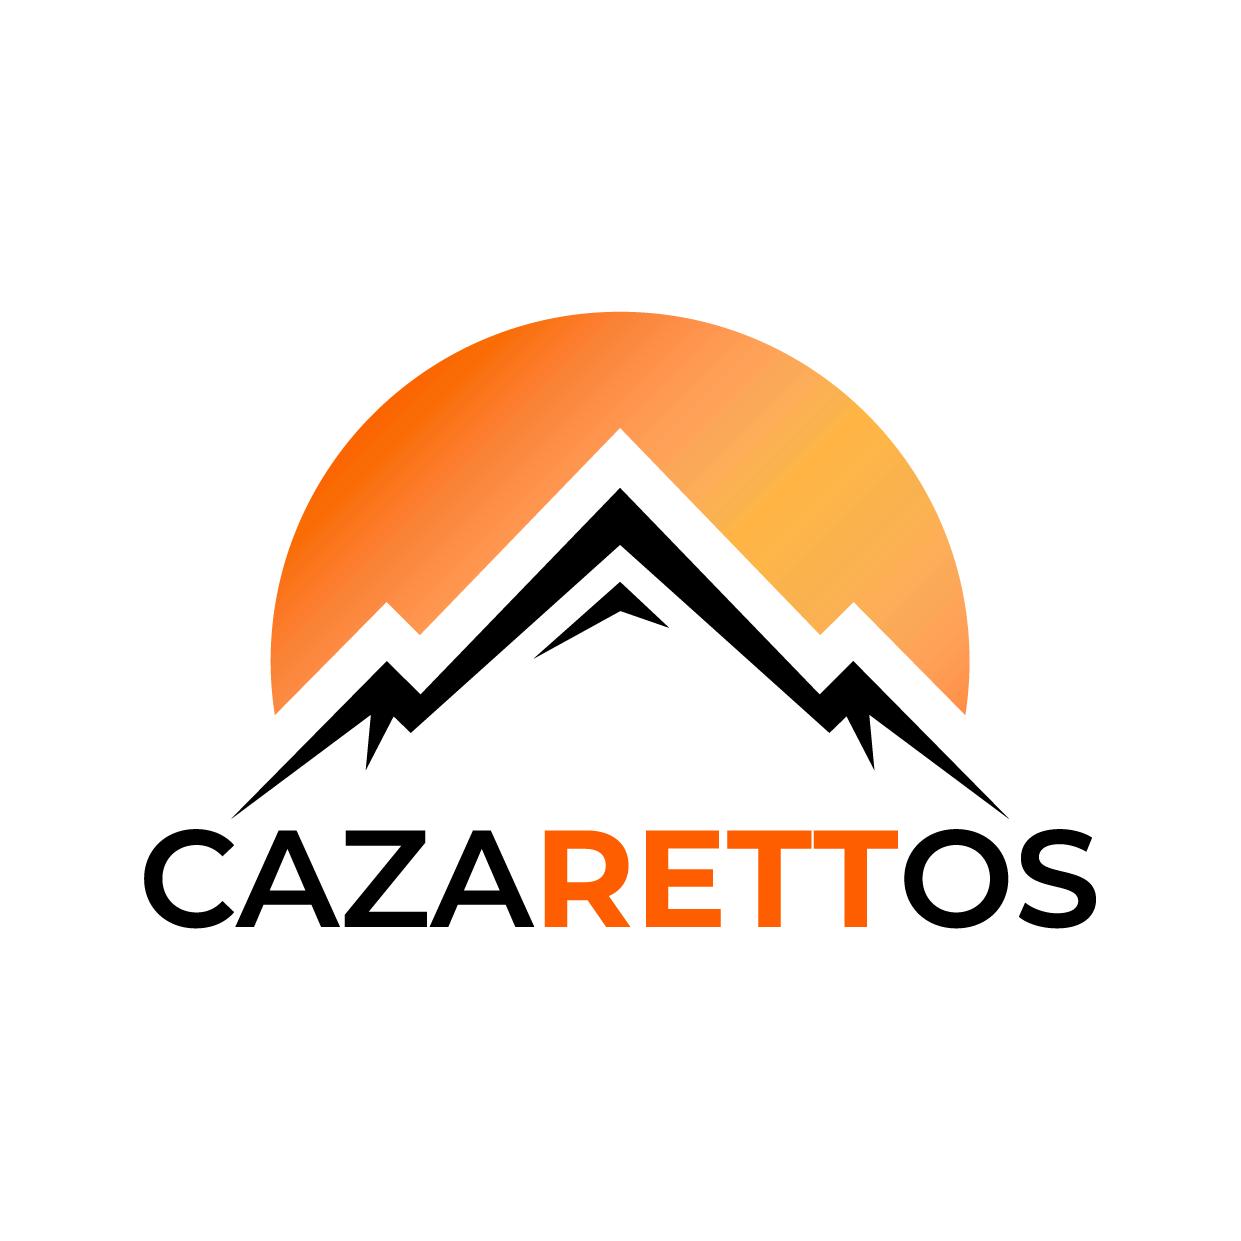 Cazarettos